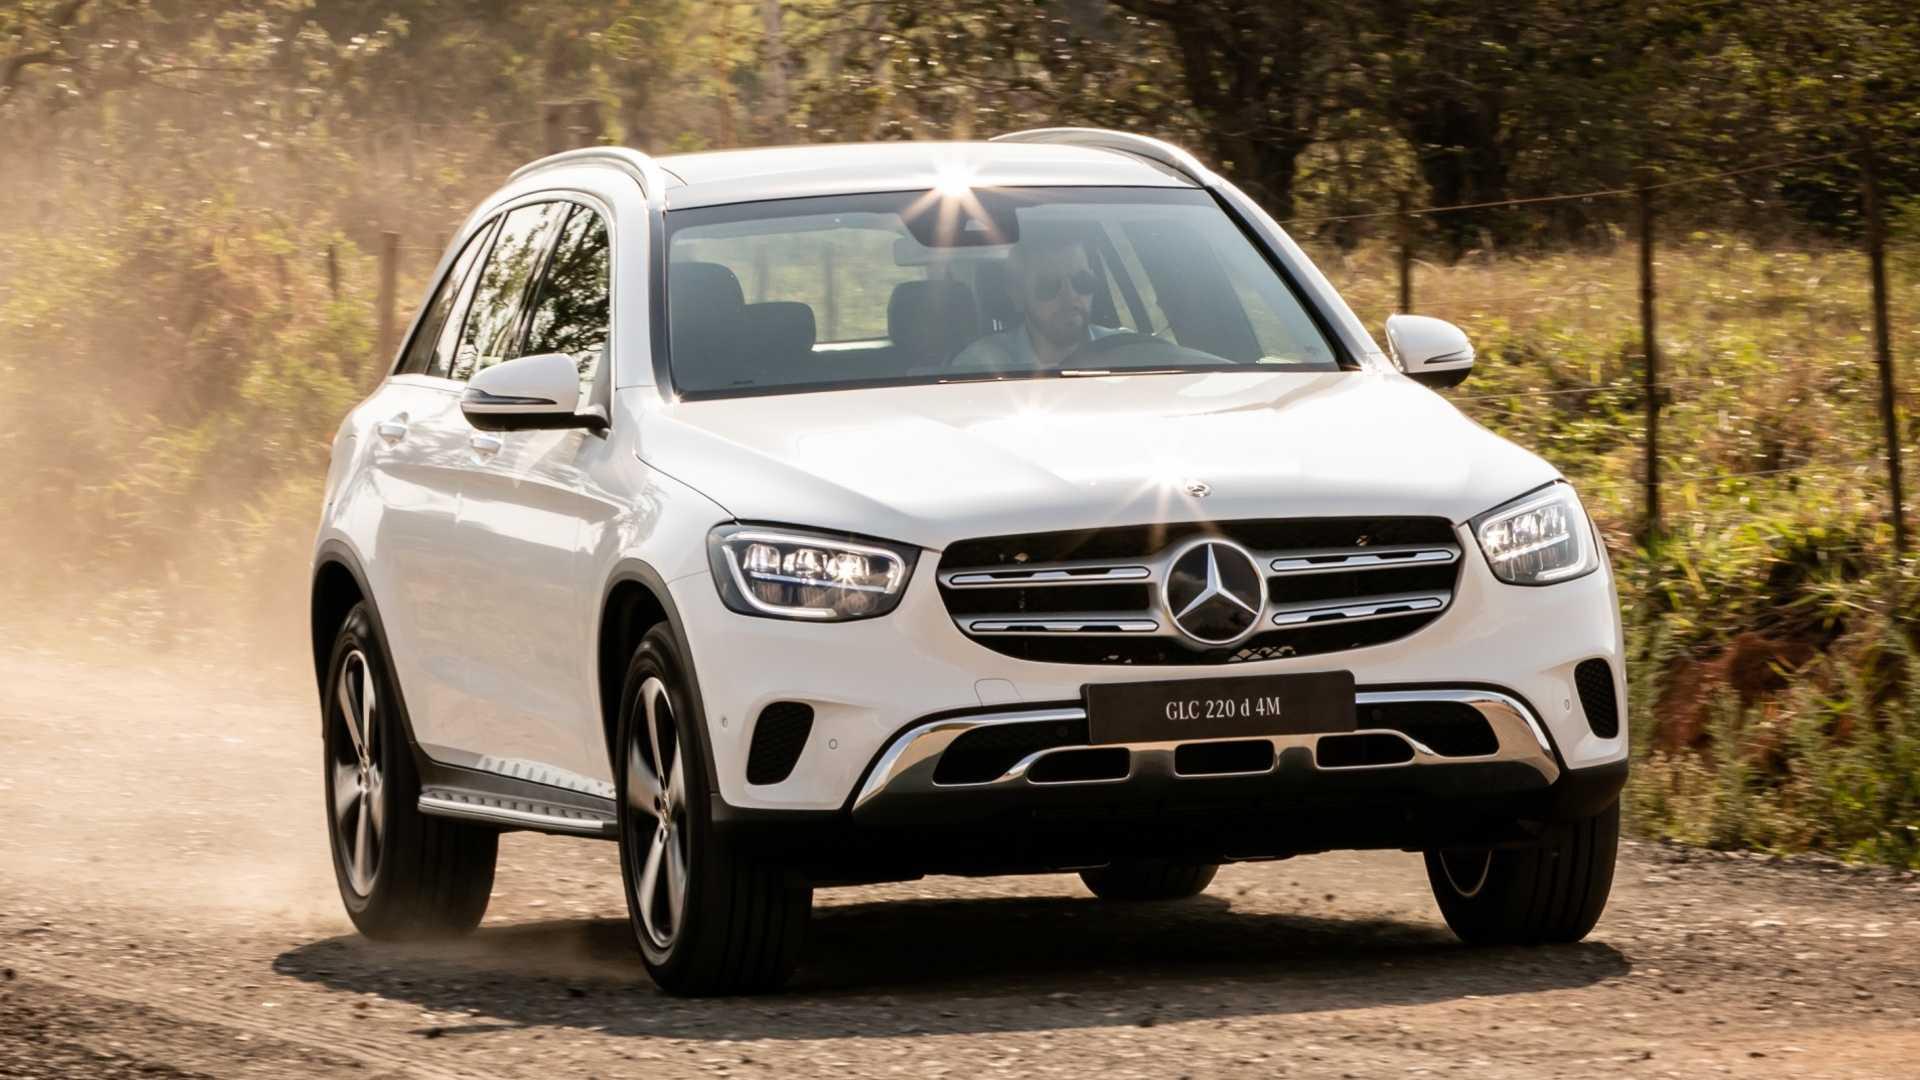 Mercedes Benz Glc 2020 Chega Ao Brasil Apenas A Diesel Por R 294 900